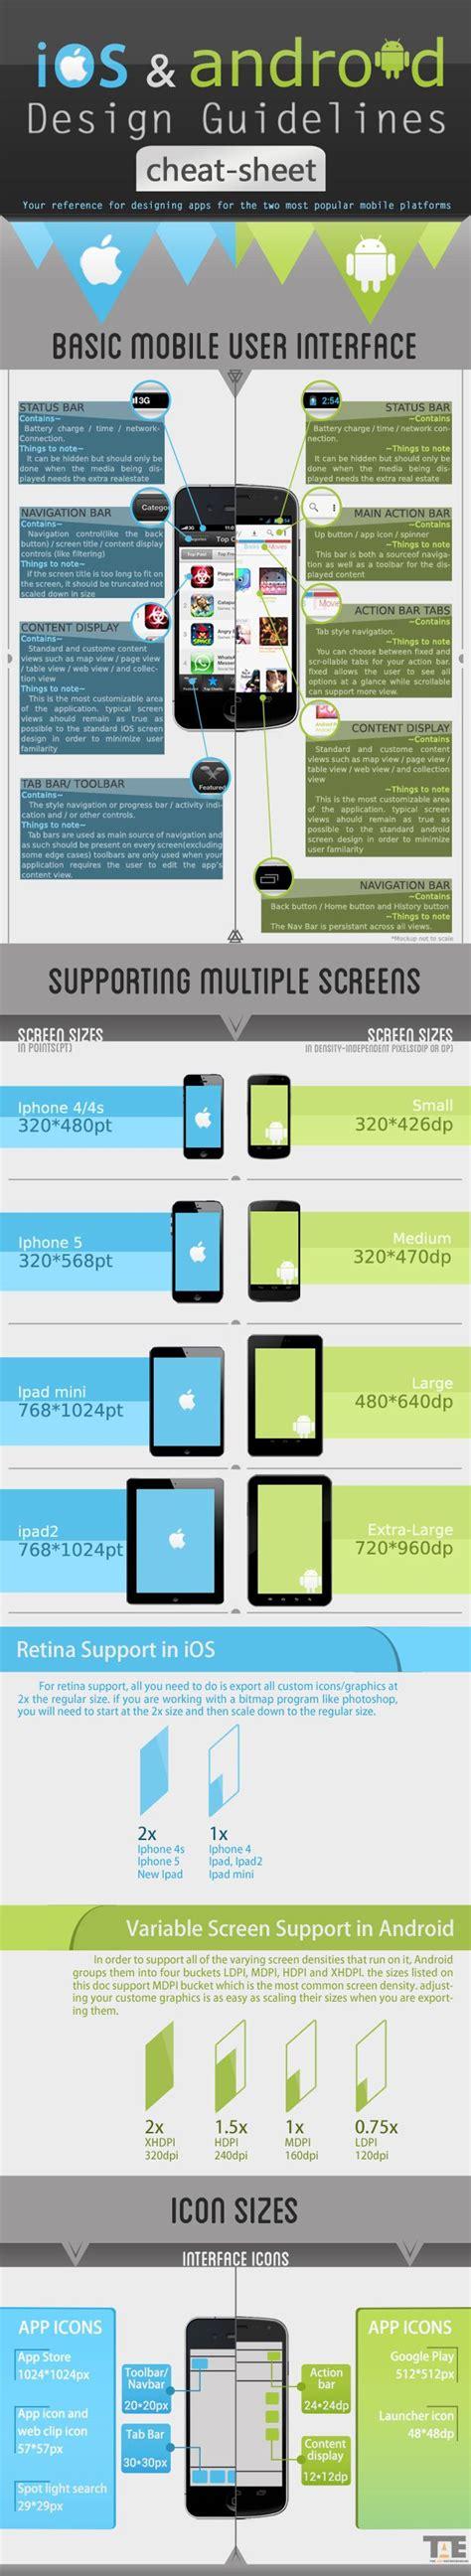 ios design guidelines navigation 25 unique design guidelines ideas on pinterest brand